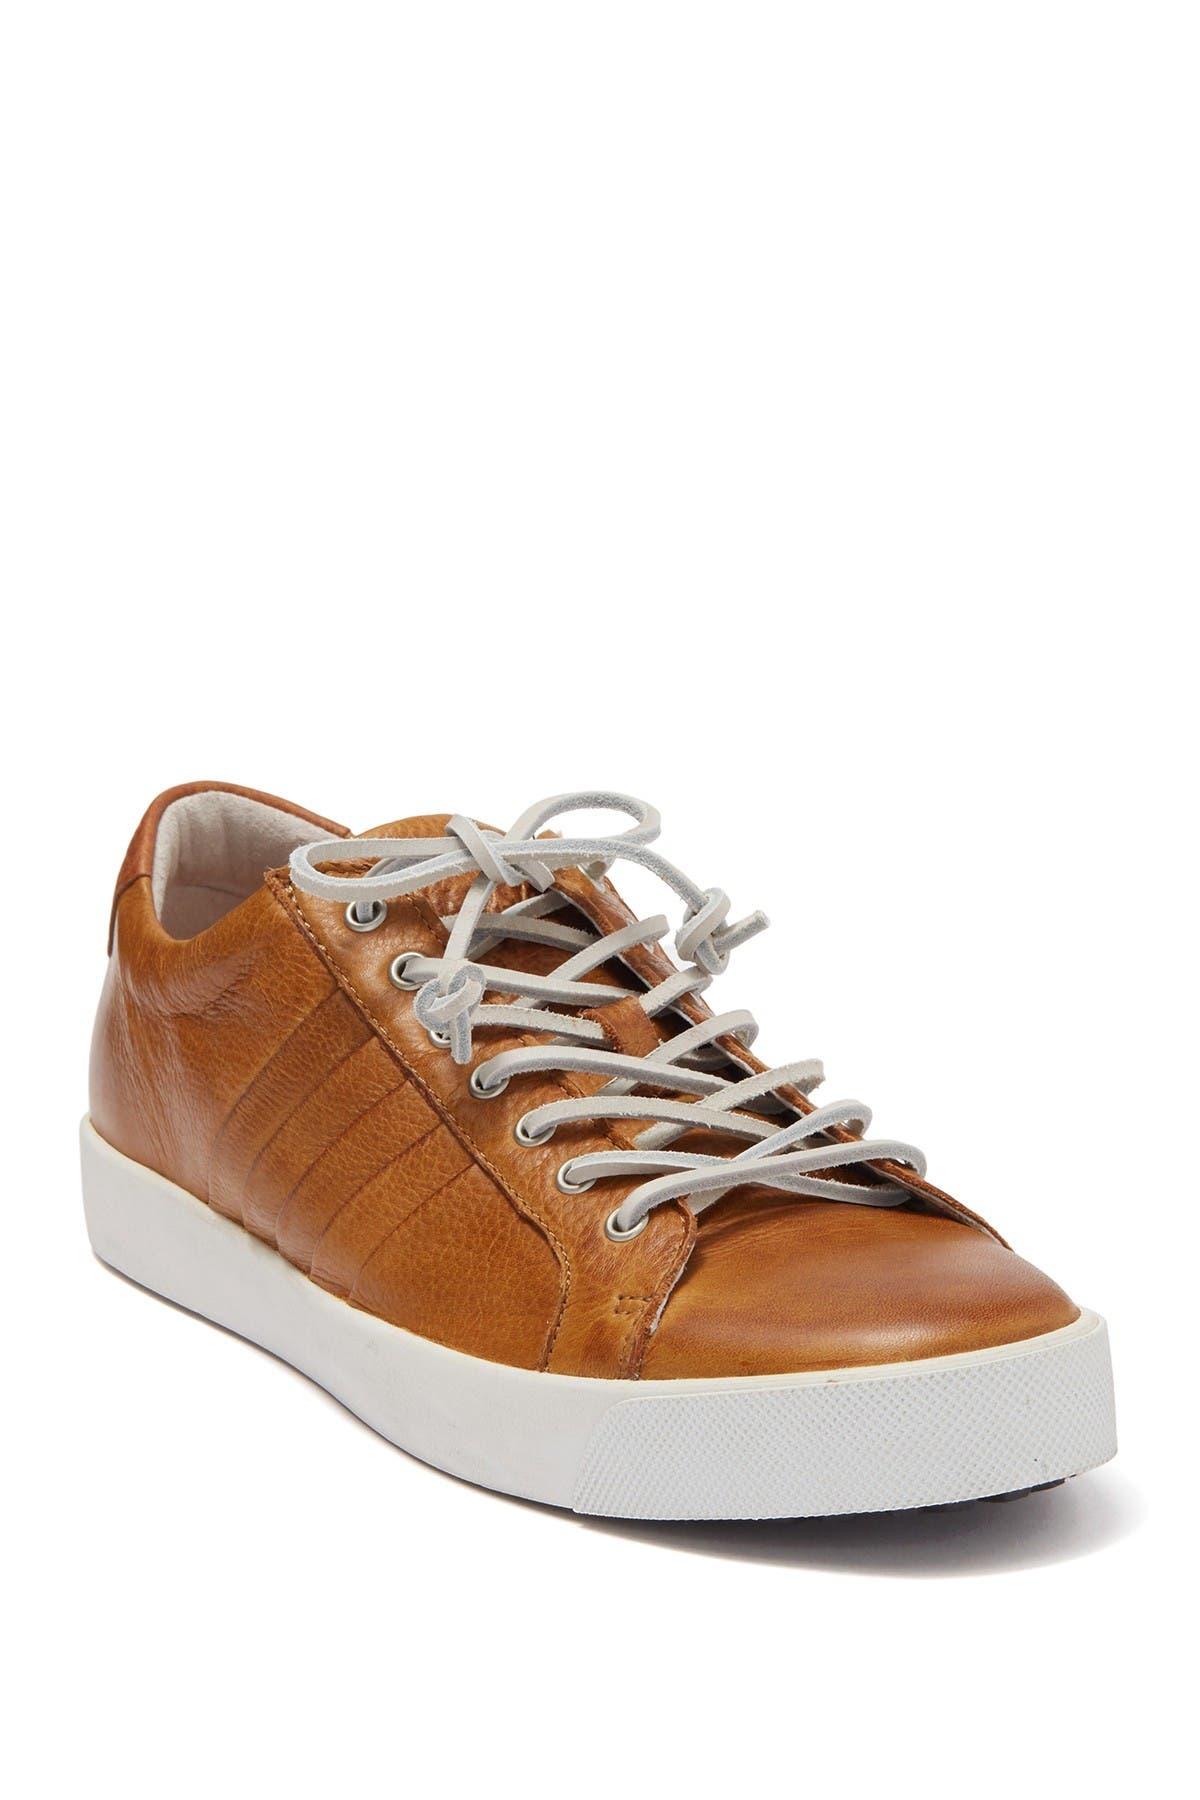 Blackstone | Leather Low Top Sneaker